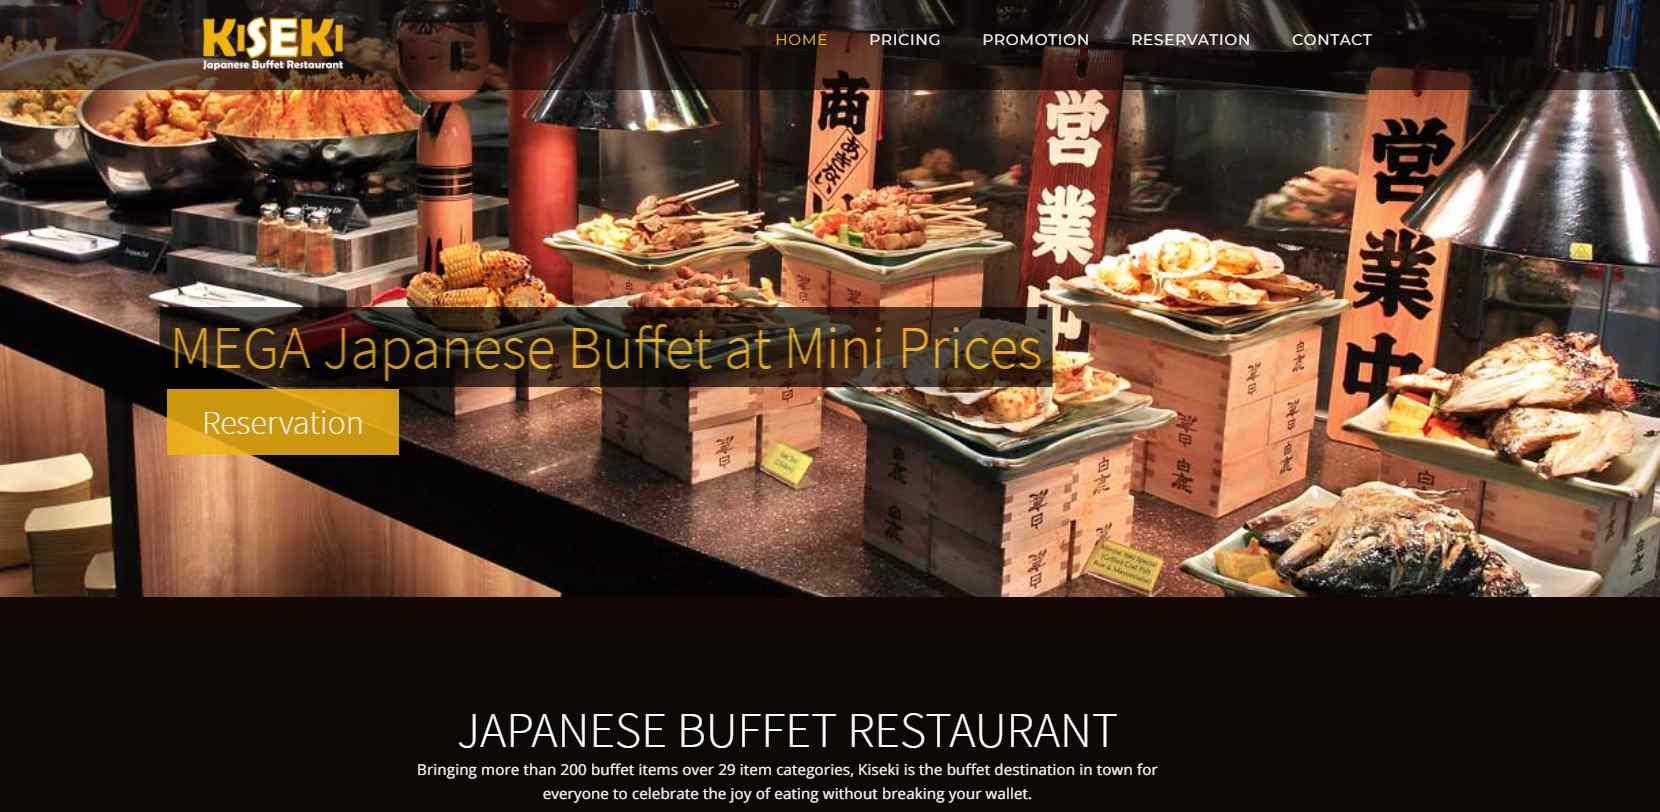 kiseki Top Japanese Buffets in Singapore